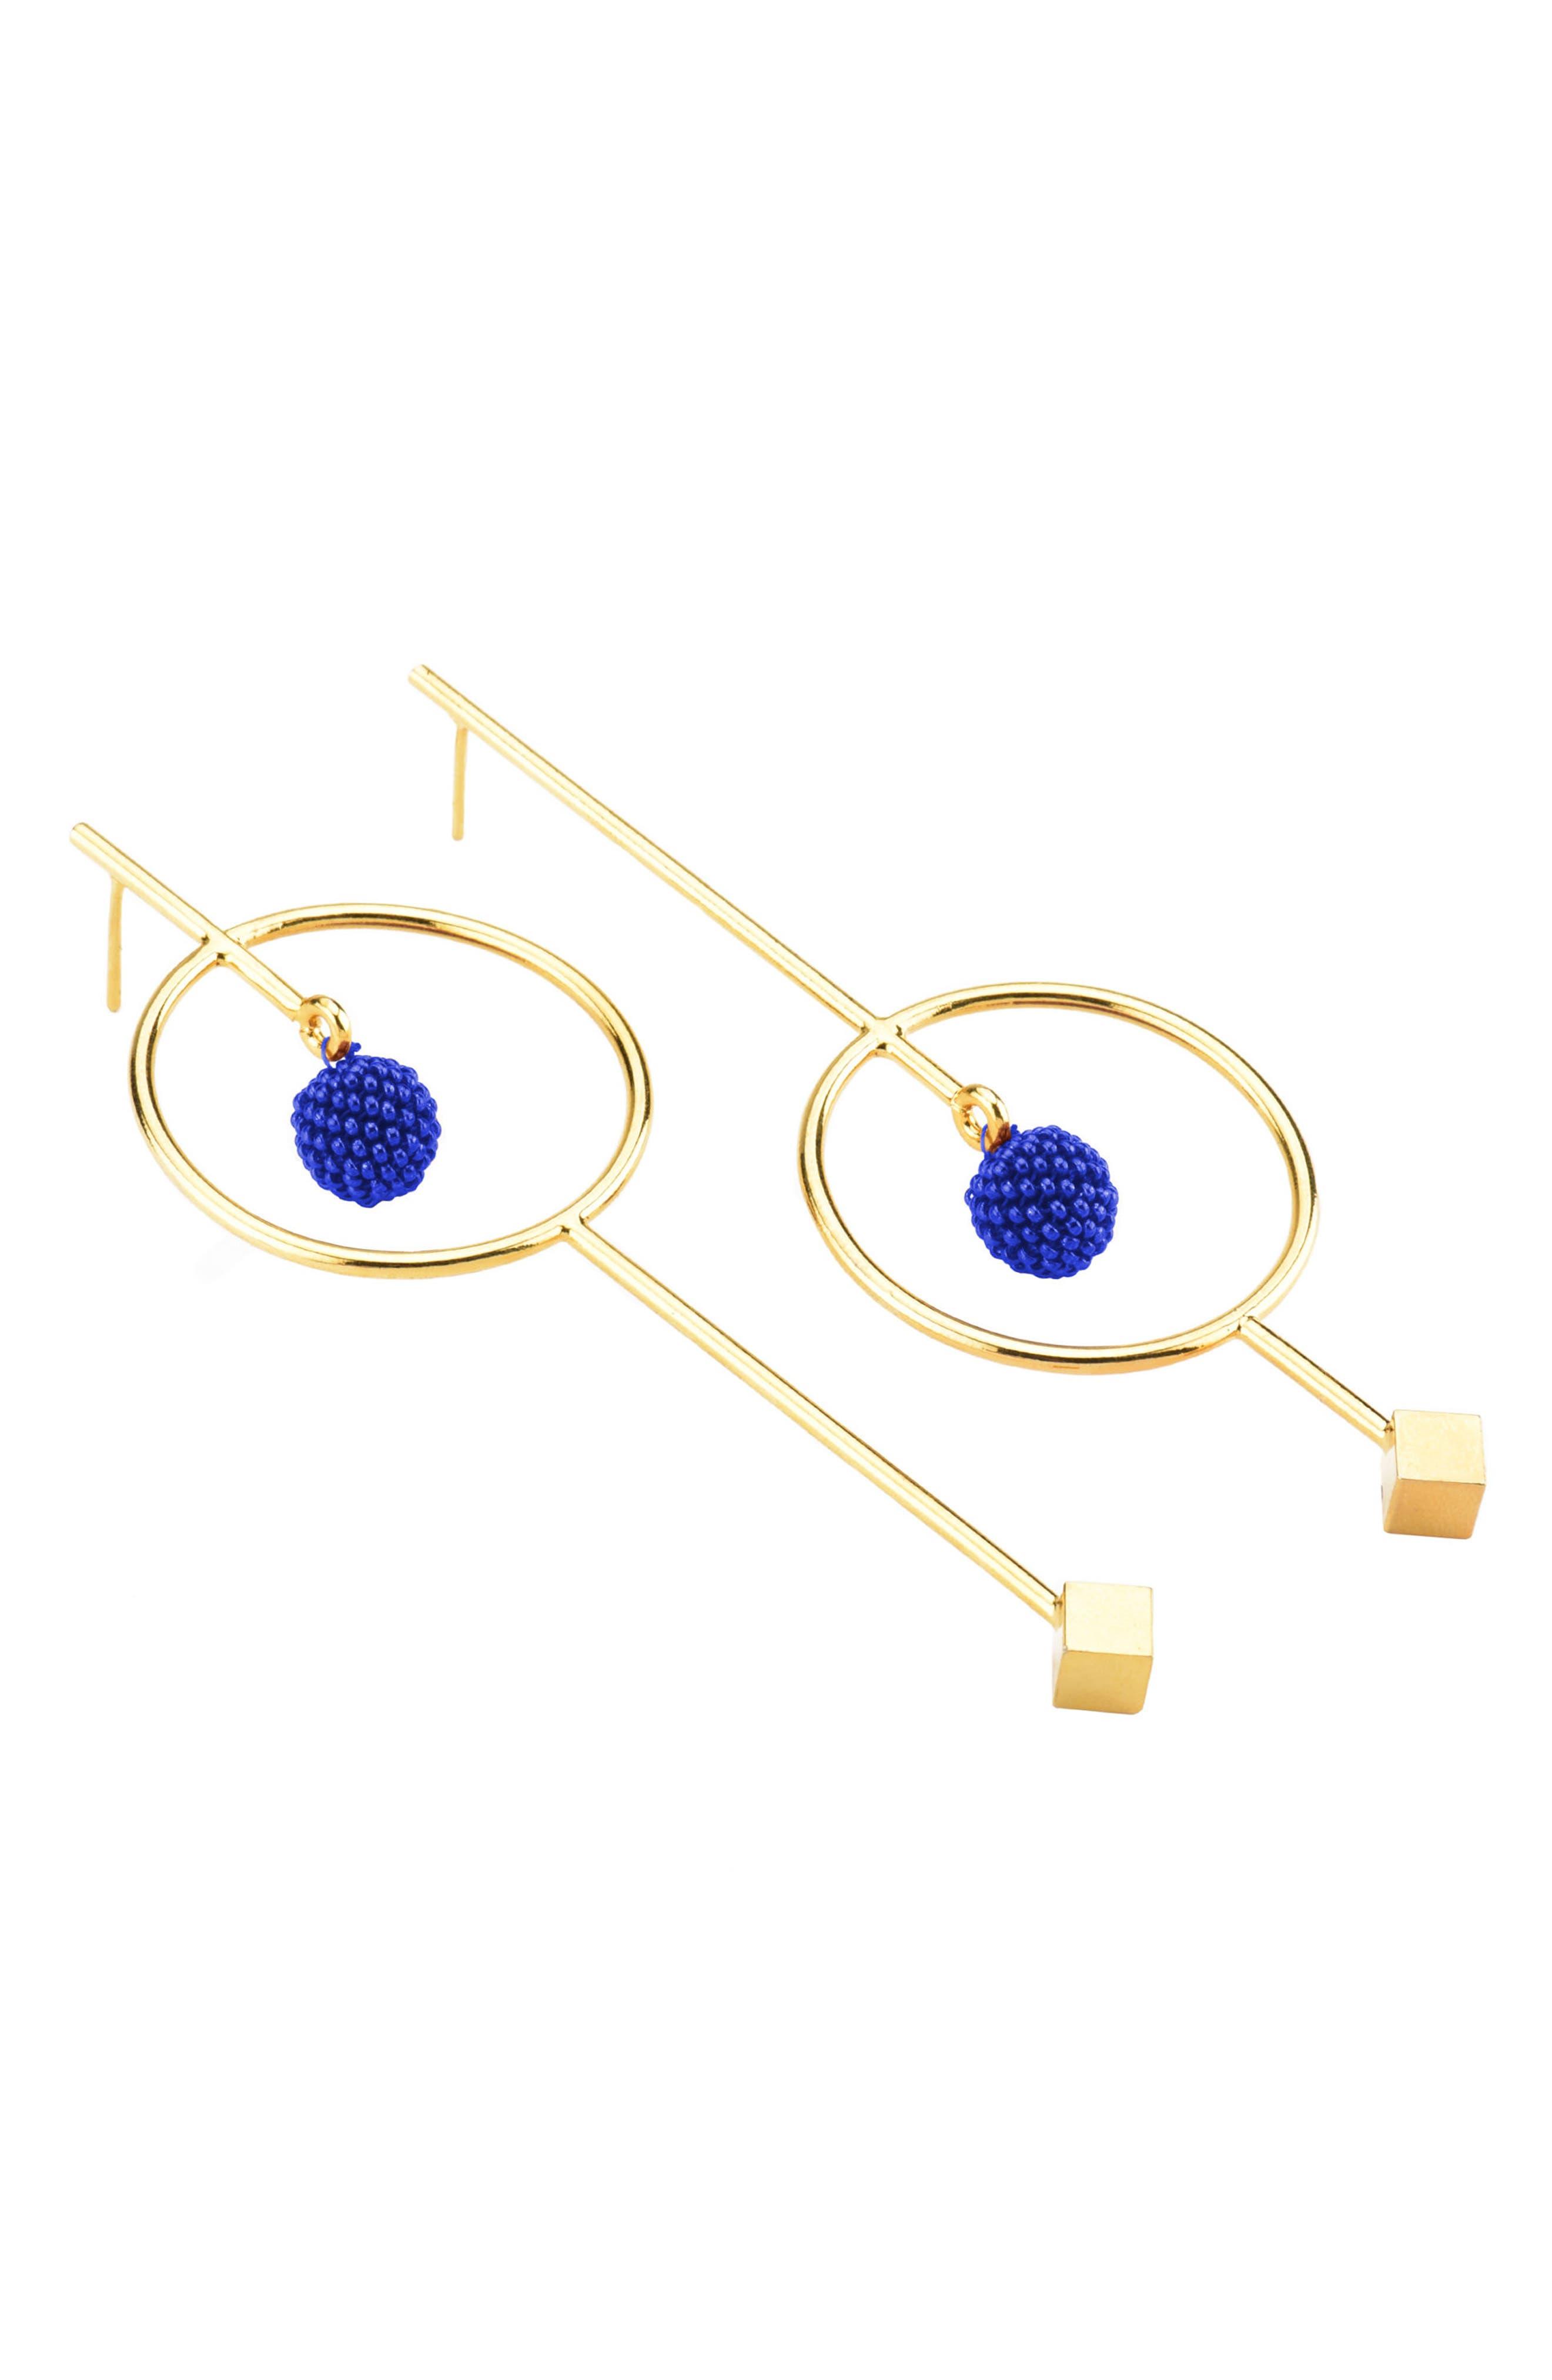 Circle & Bead Statement Earrings,                             Main thumbnail 1, color,                             Blue